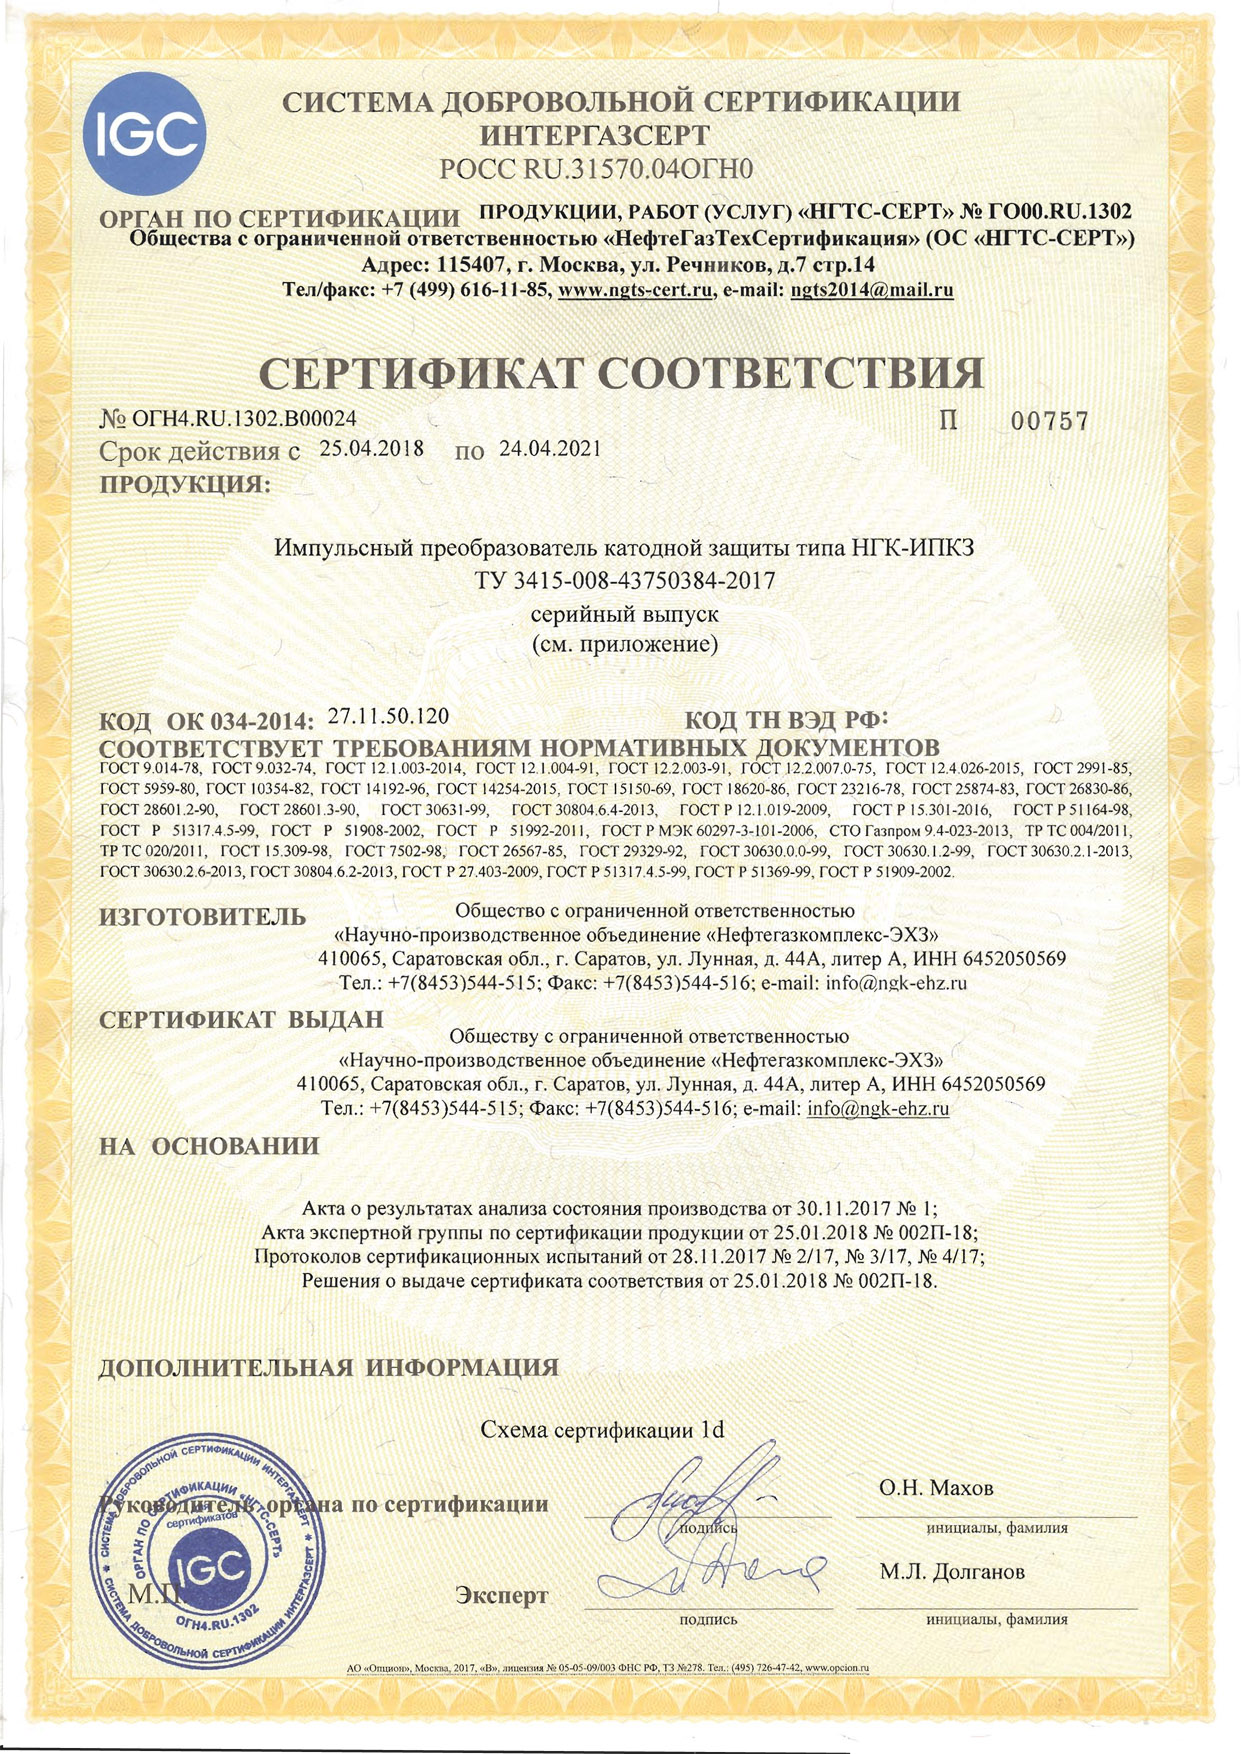 24 Нефтегазкомплекс-ЭХЗ (ИПКЗ)-1